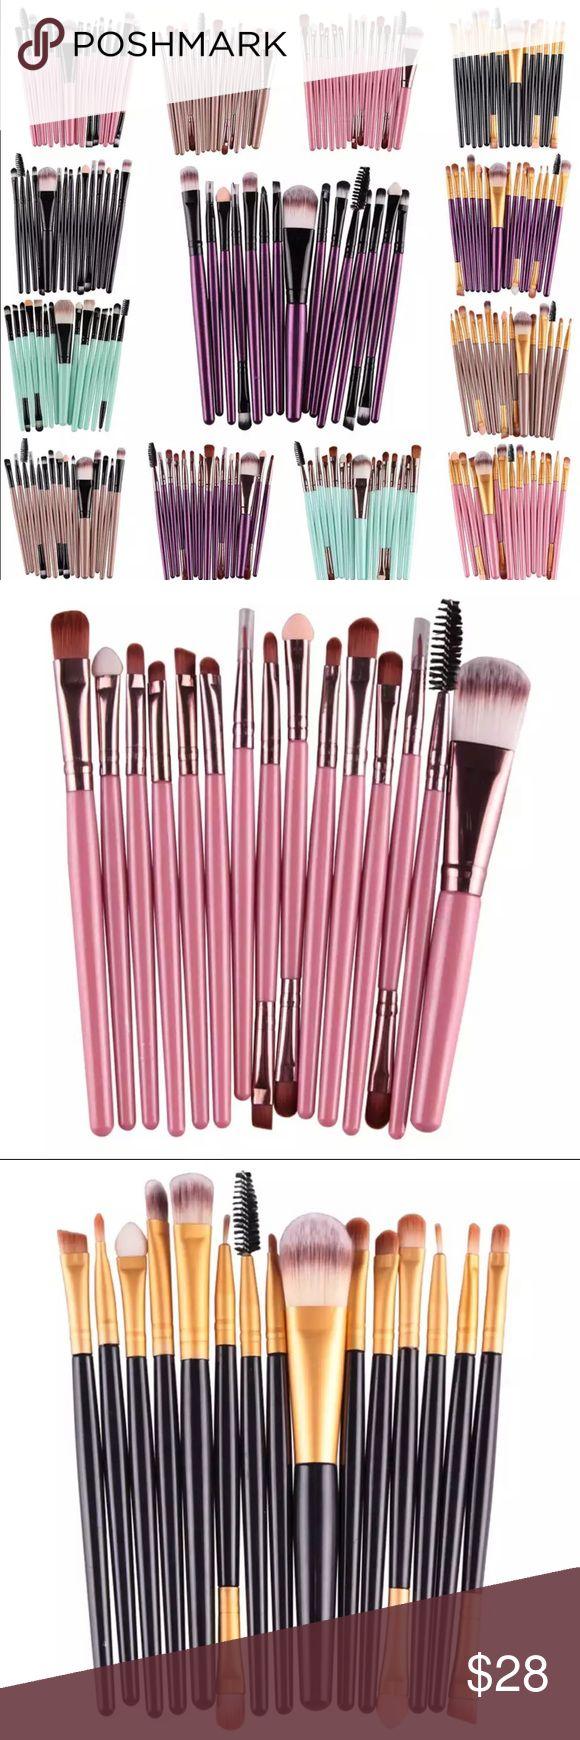 15pcs Make-up Brushes Set Professional Make-up Brushes Set 15 pcs  Handle Materi…